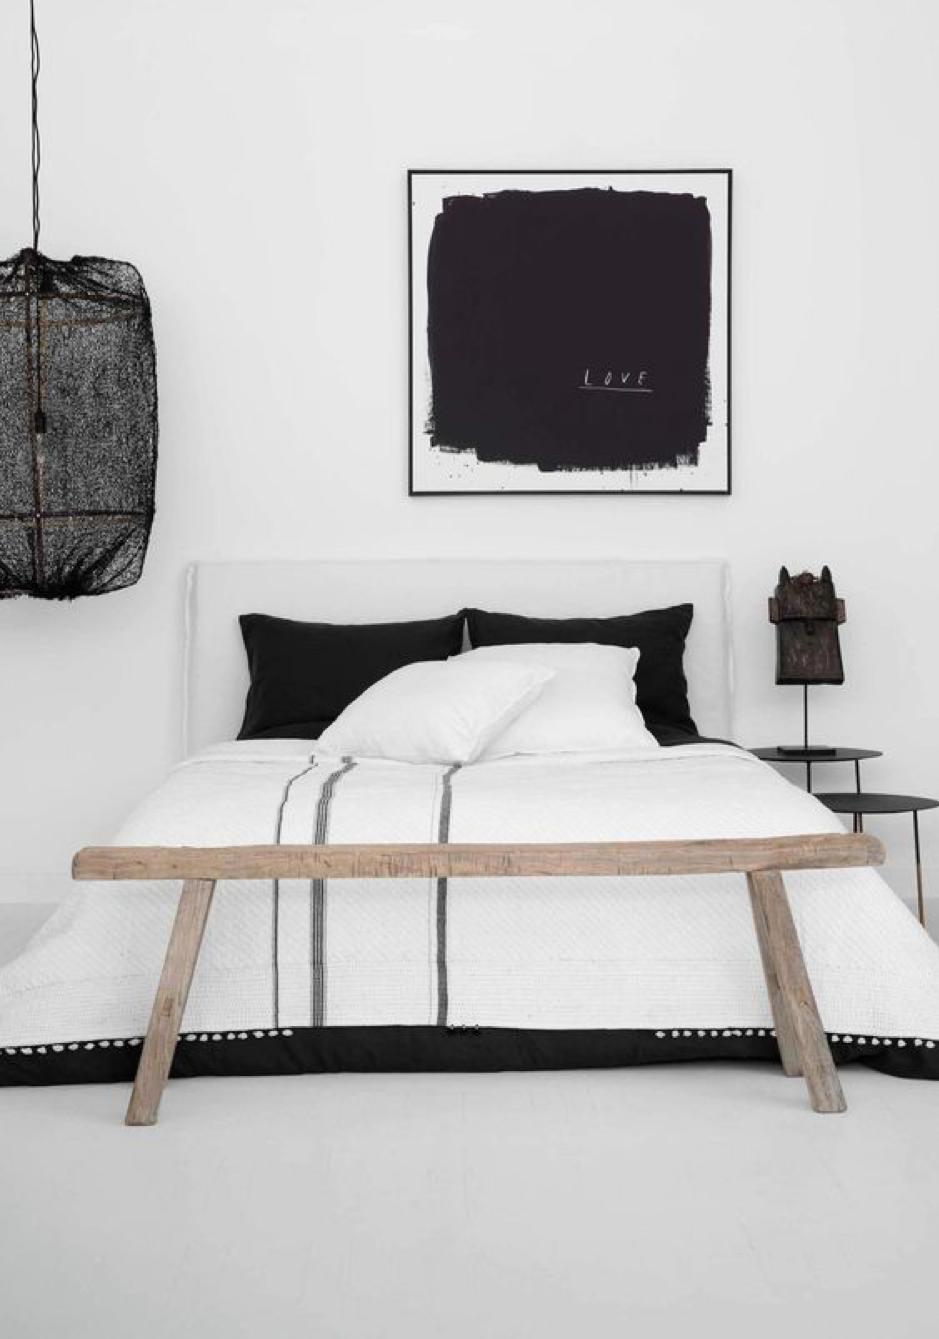 Monochrome Bedroom Envy   Pamela Makin's residence in Whale Beach. Image via Felix Forest